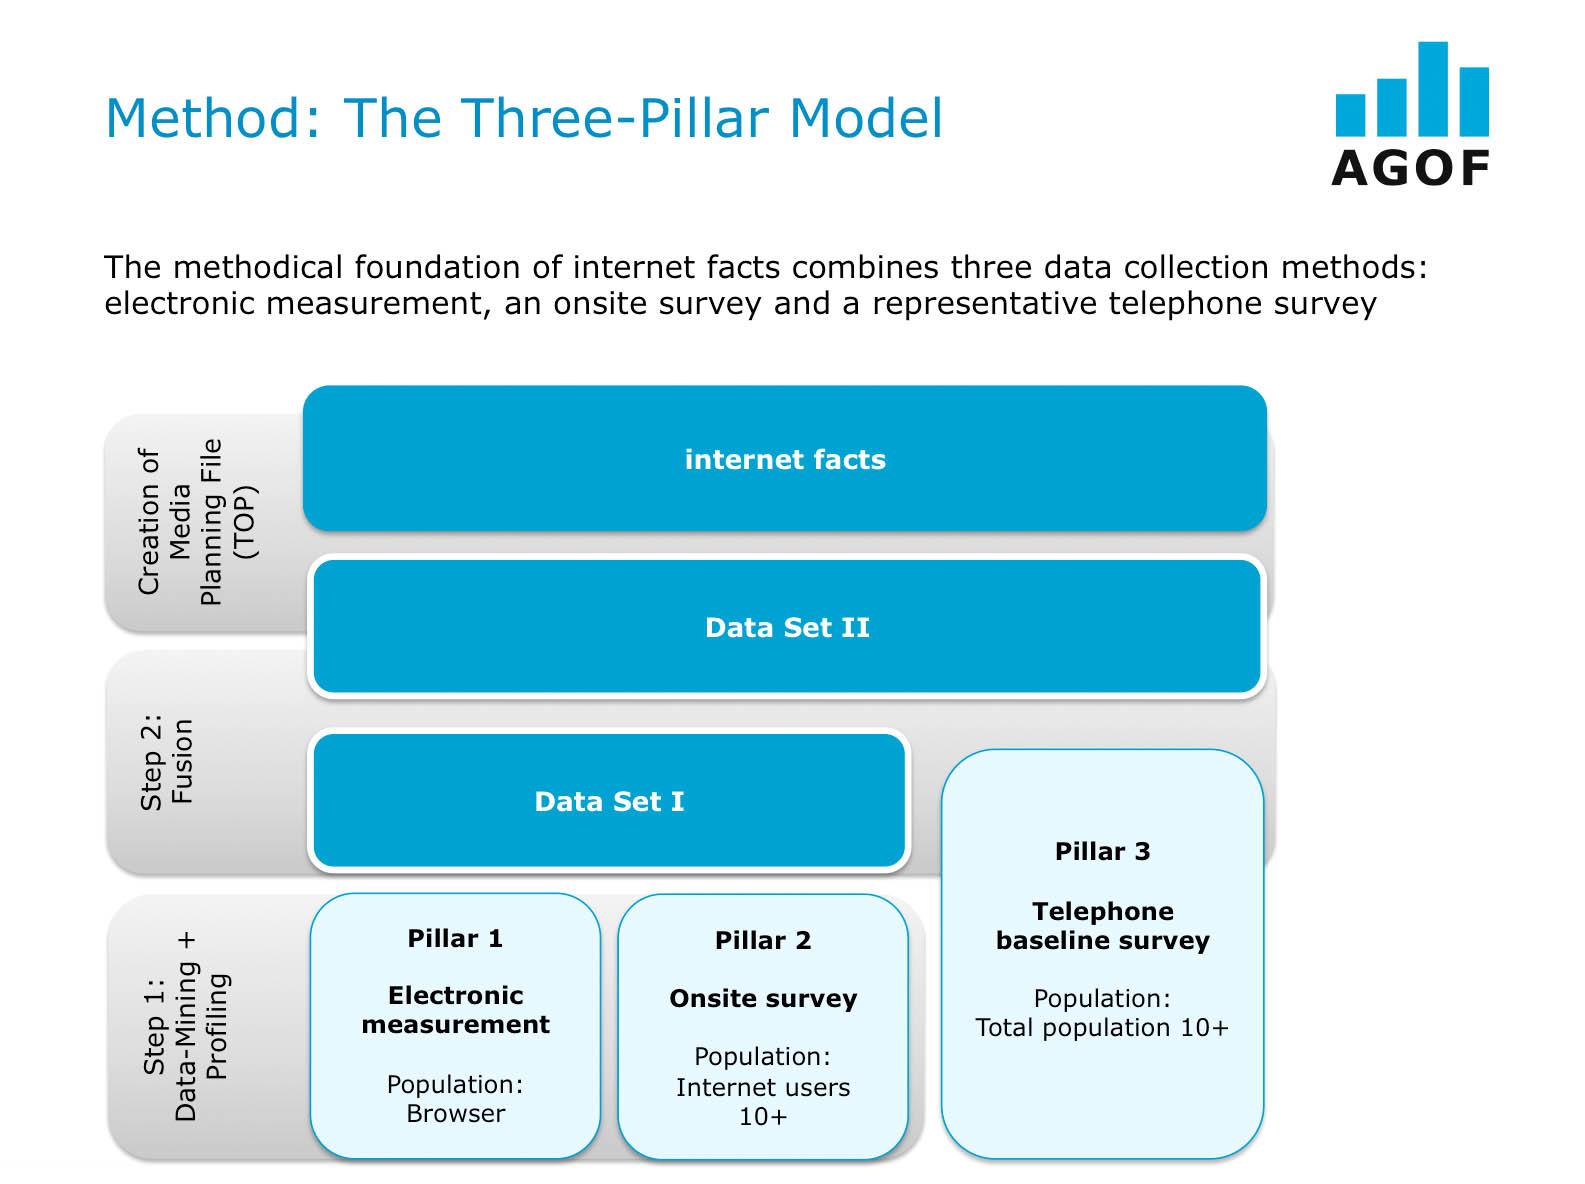 Method: The Three-Pillar Model